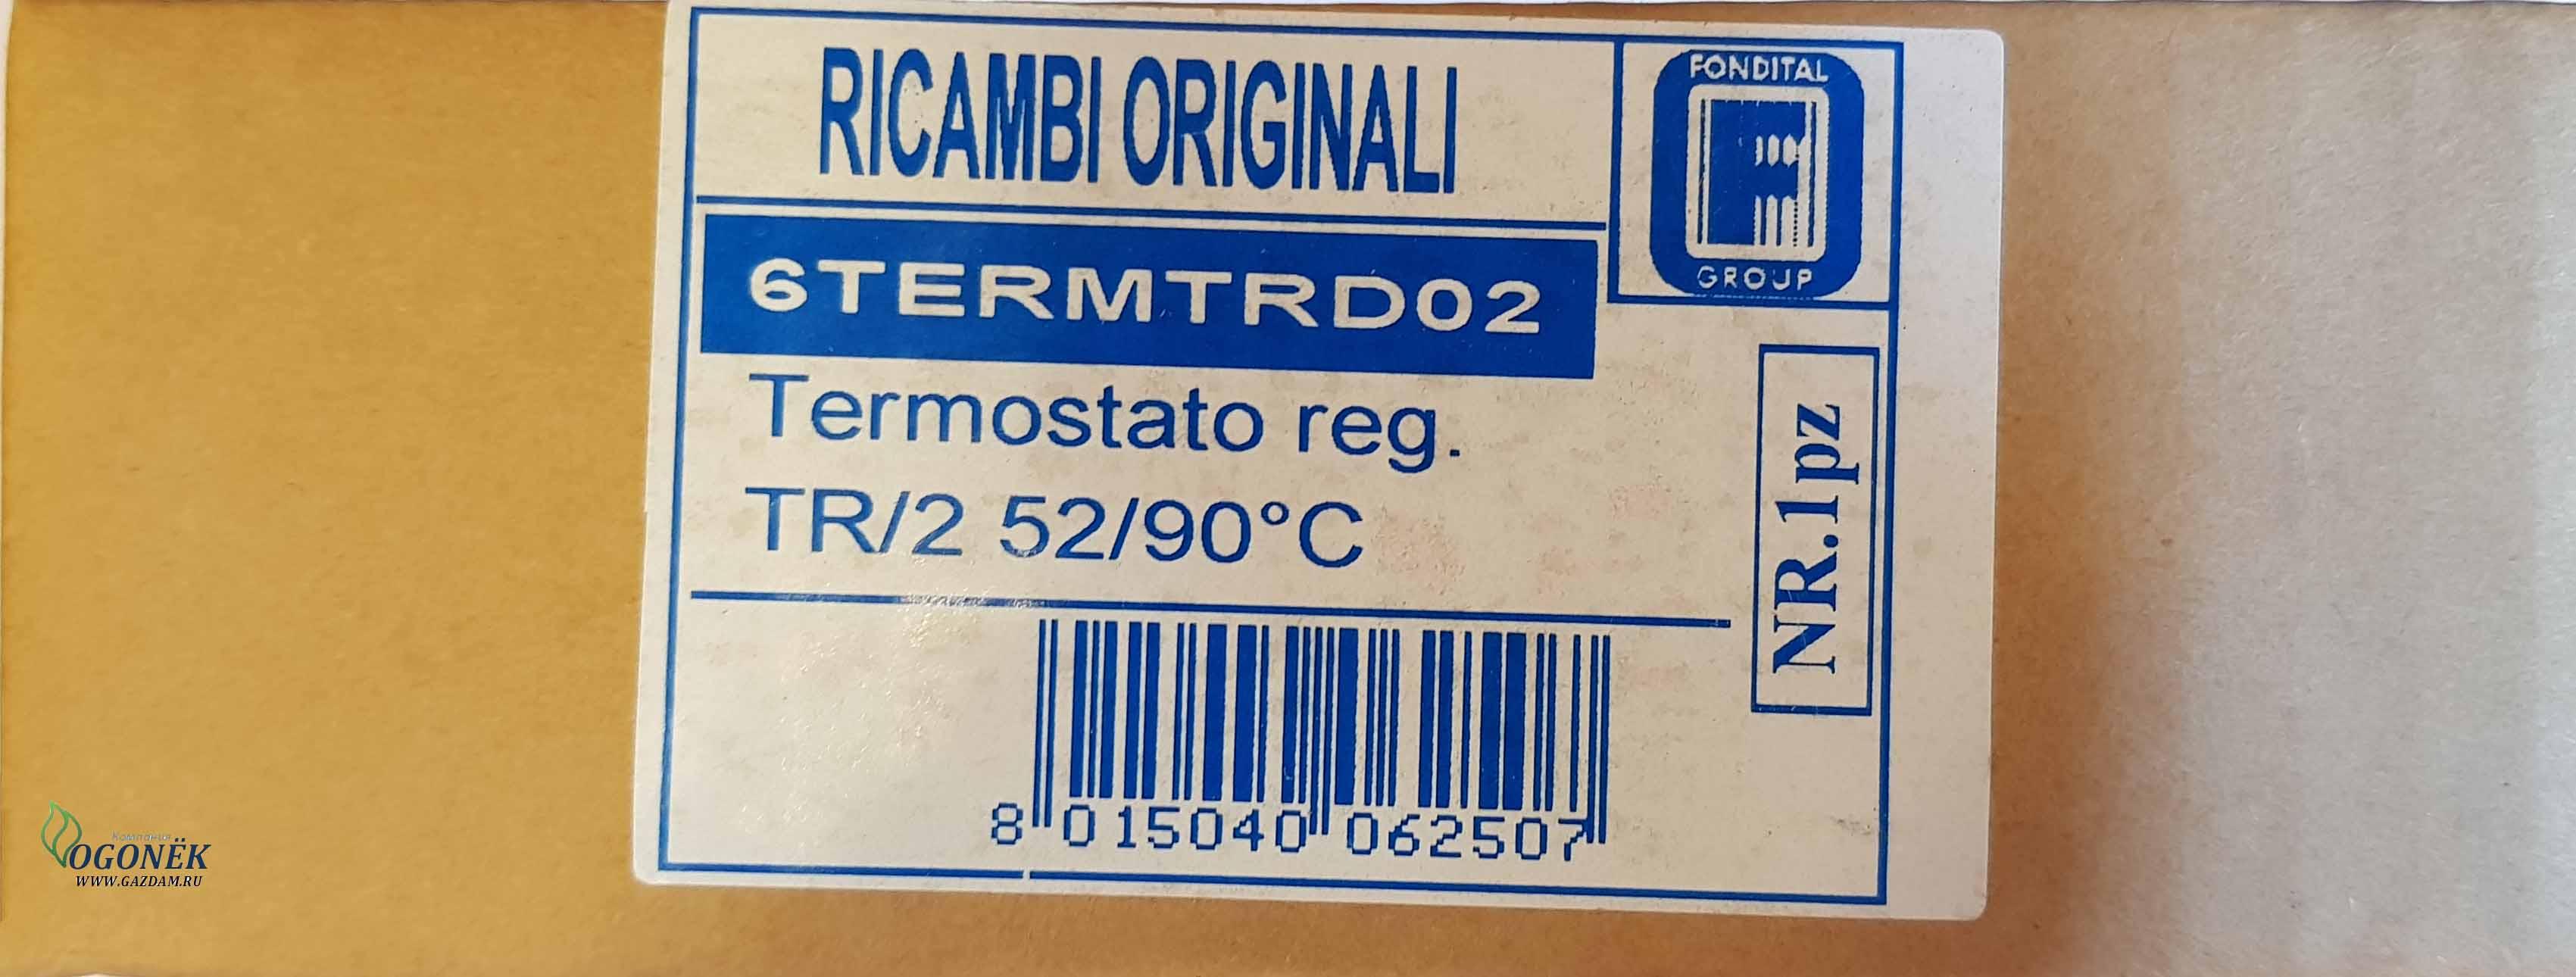 6TERMTRD02 ТЕРМОСТАТ РЕГУЛИРОВАНИЯ 90°С (РОССИЯ)  TERMOSTATO DI REGOLAZIONE 90 °C